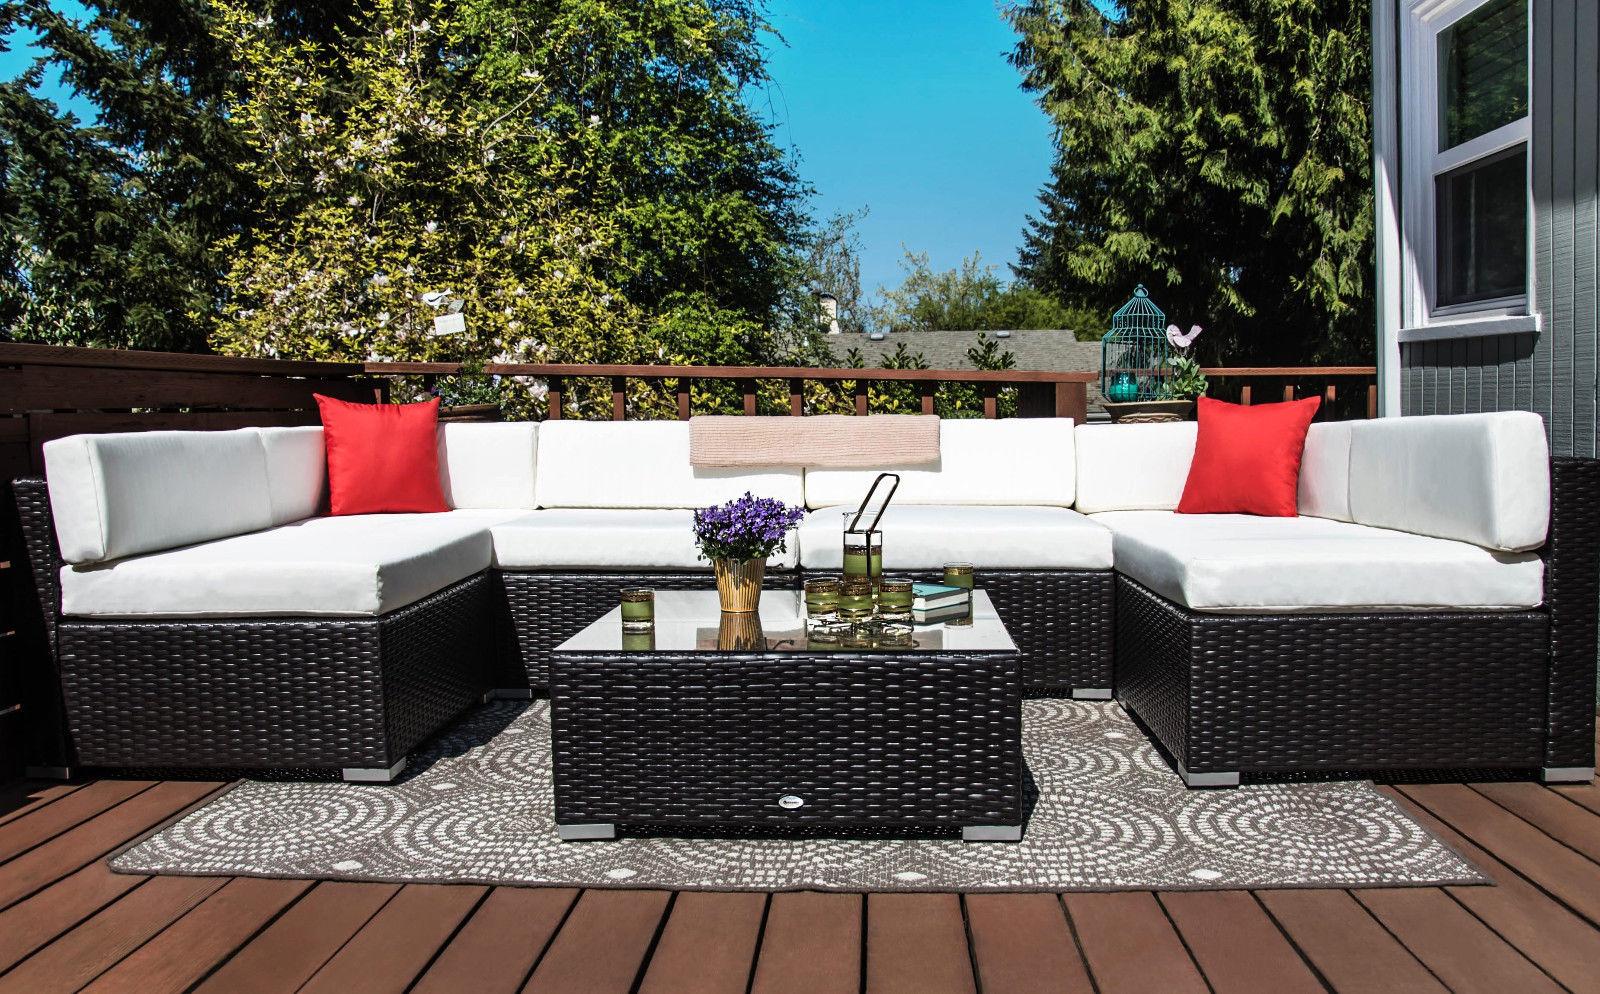 Outsunny 7 Piece Outdoor Patio Rattan Wicker Sofa Sectional Set - Cream 1